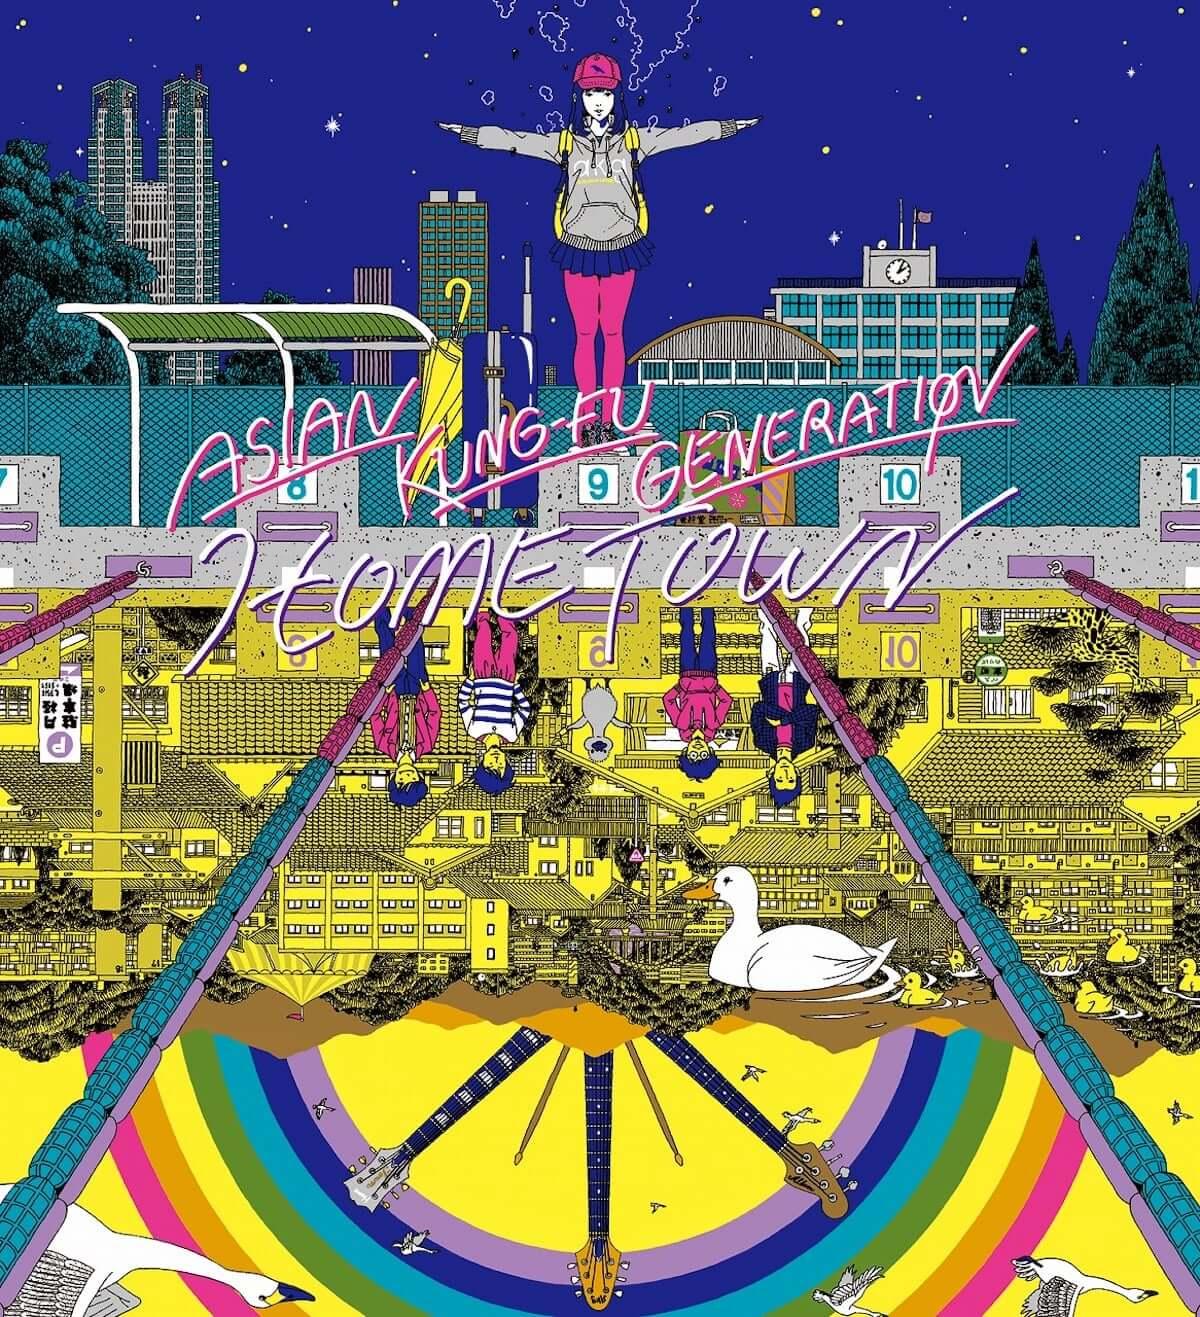 ASIAN KUNG-FU GENERATION、新曲MVを2本同時公開 music181227_AKG02-1200x1317